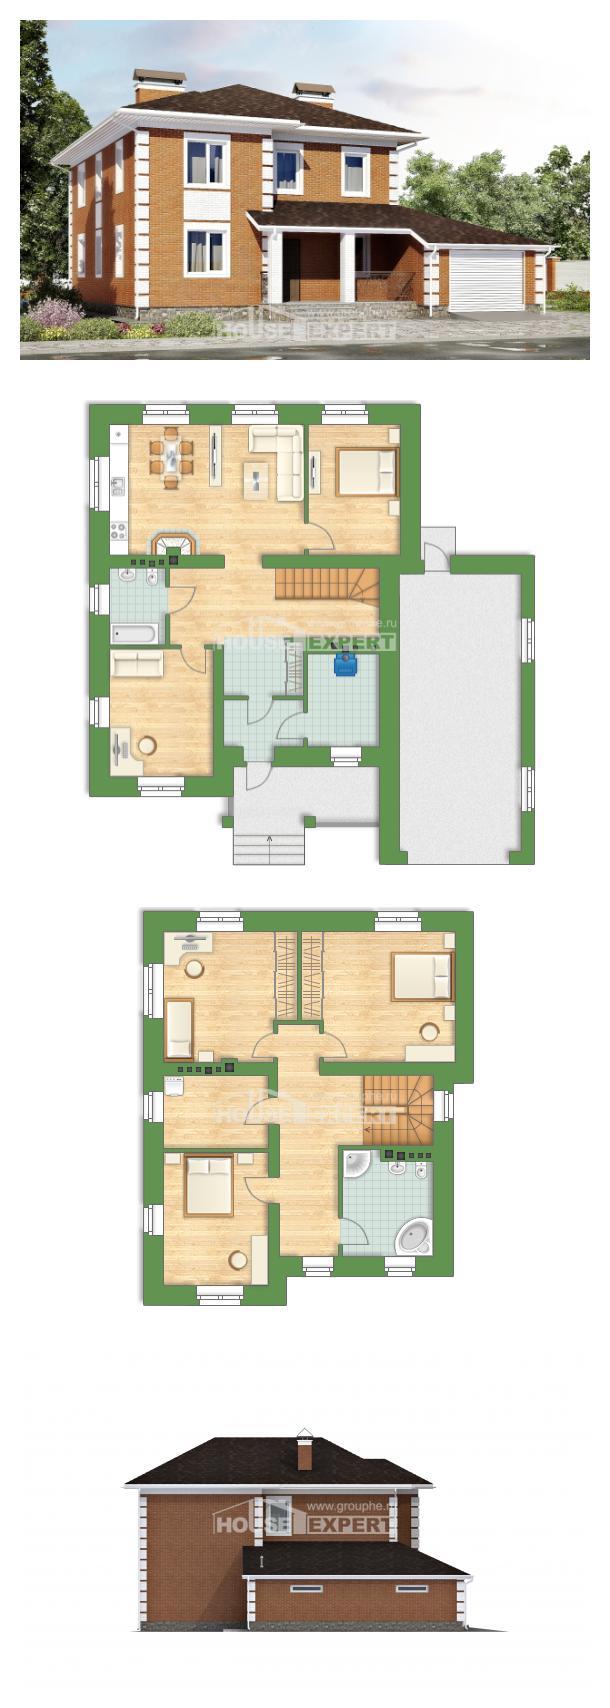 Projekt domu 220-004-L | House Expert